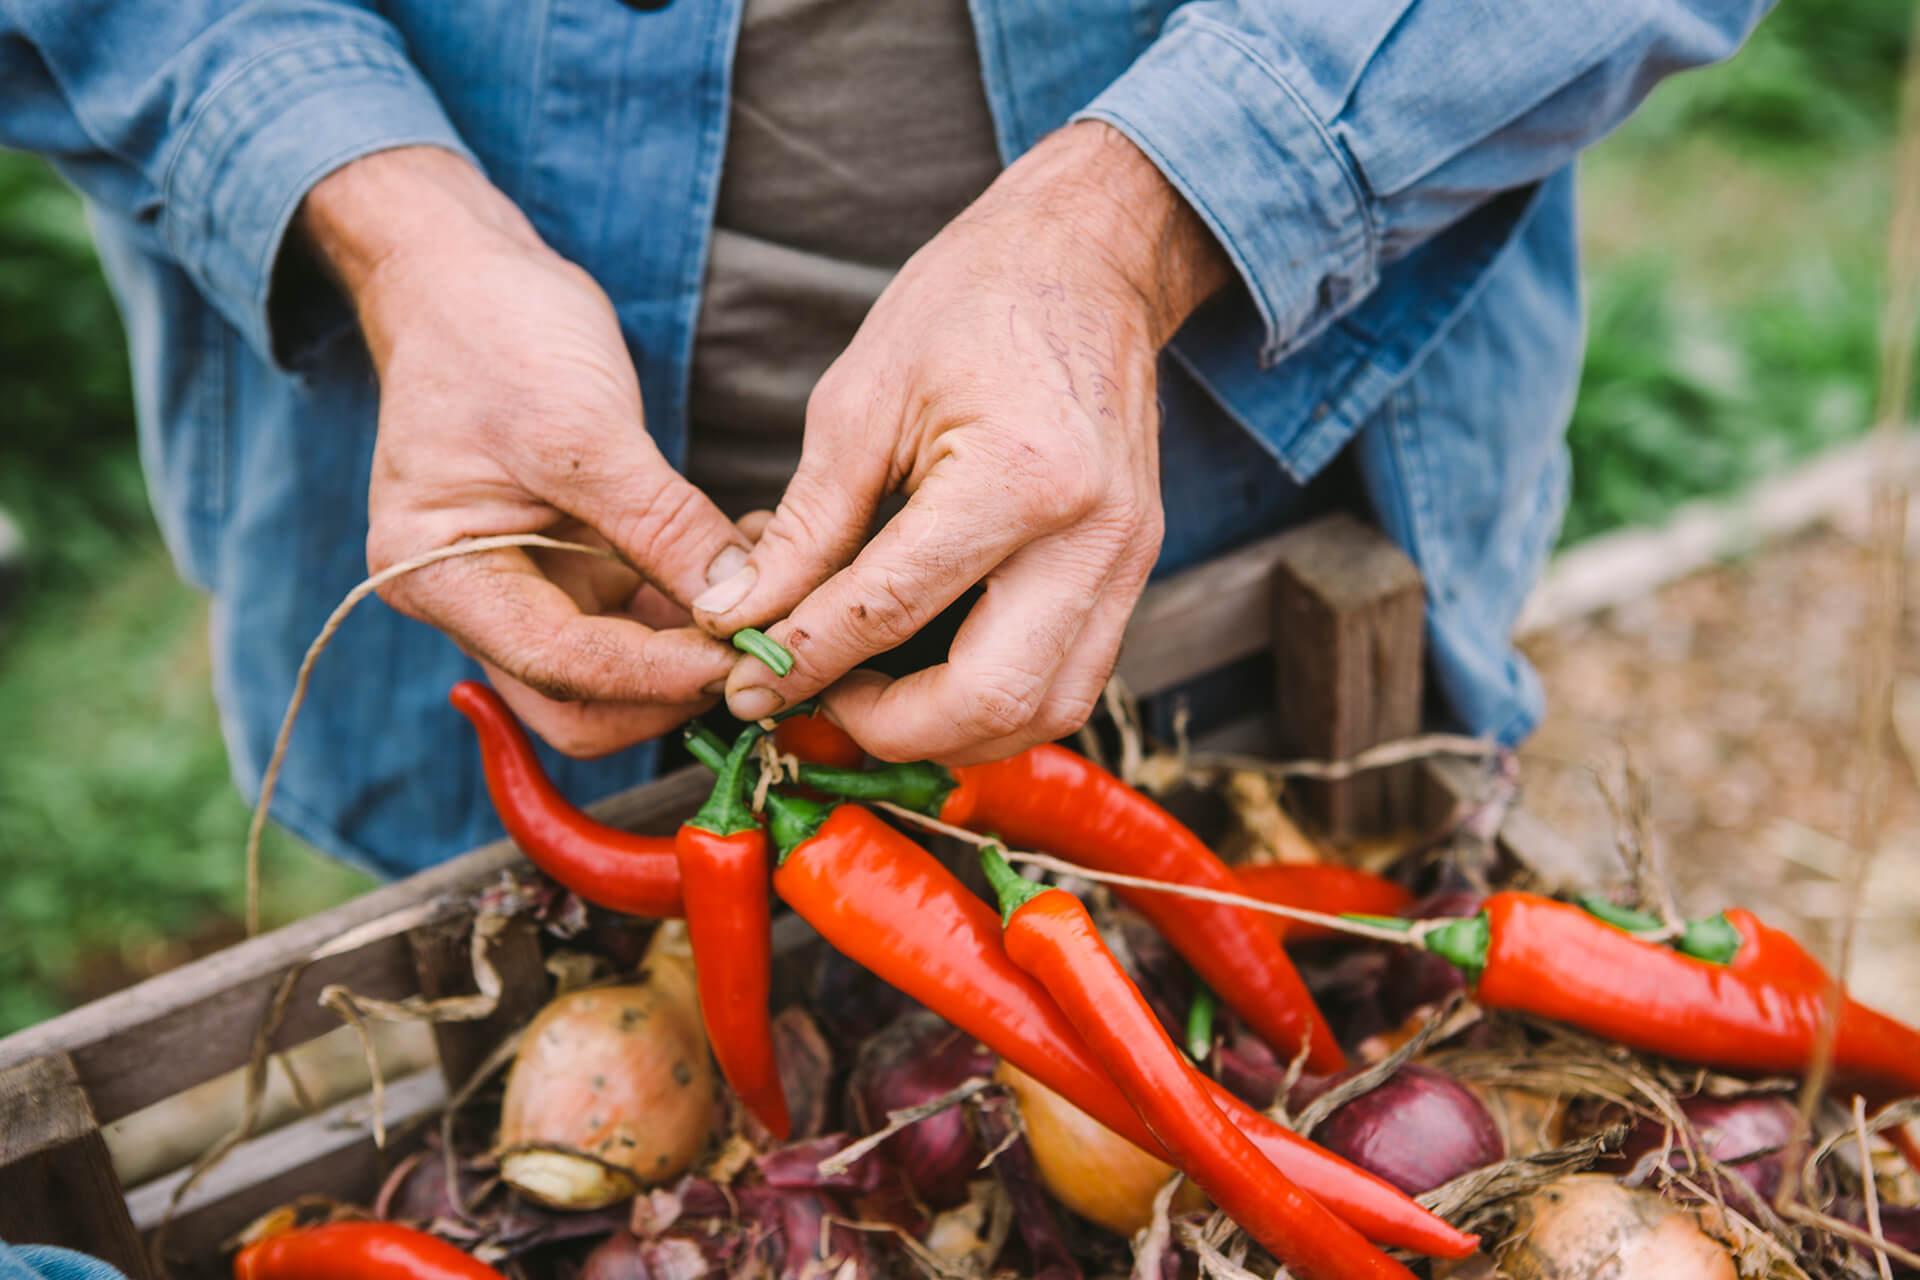 Daylesford, Daylesford Organic, Organic, Farm, Field, Green, Grass, Landscape, Chilli, Peppers, Summer, Photography, Agency, Marketing, Gloucestershire, WeAreShuffle, Autumn